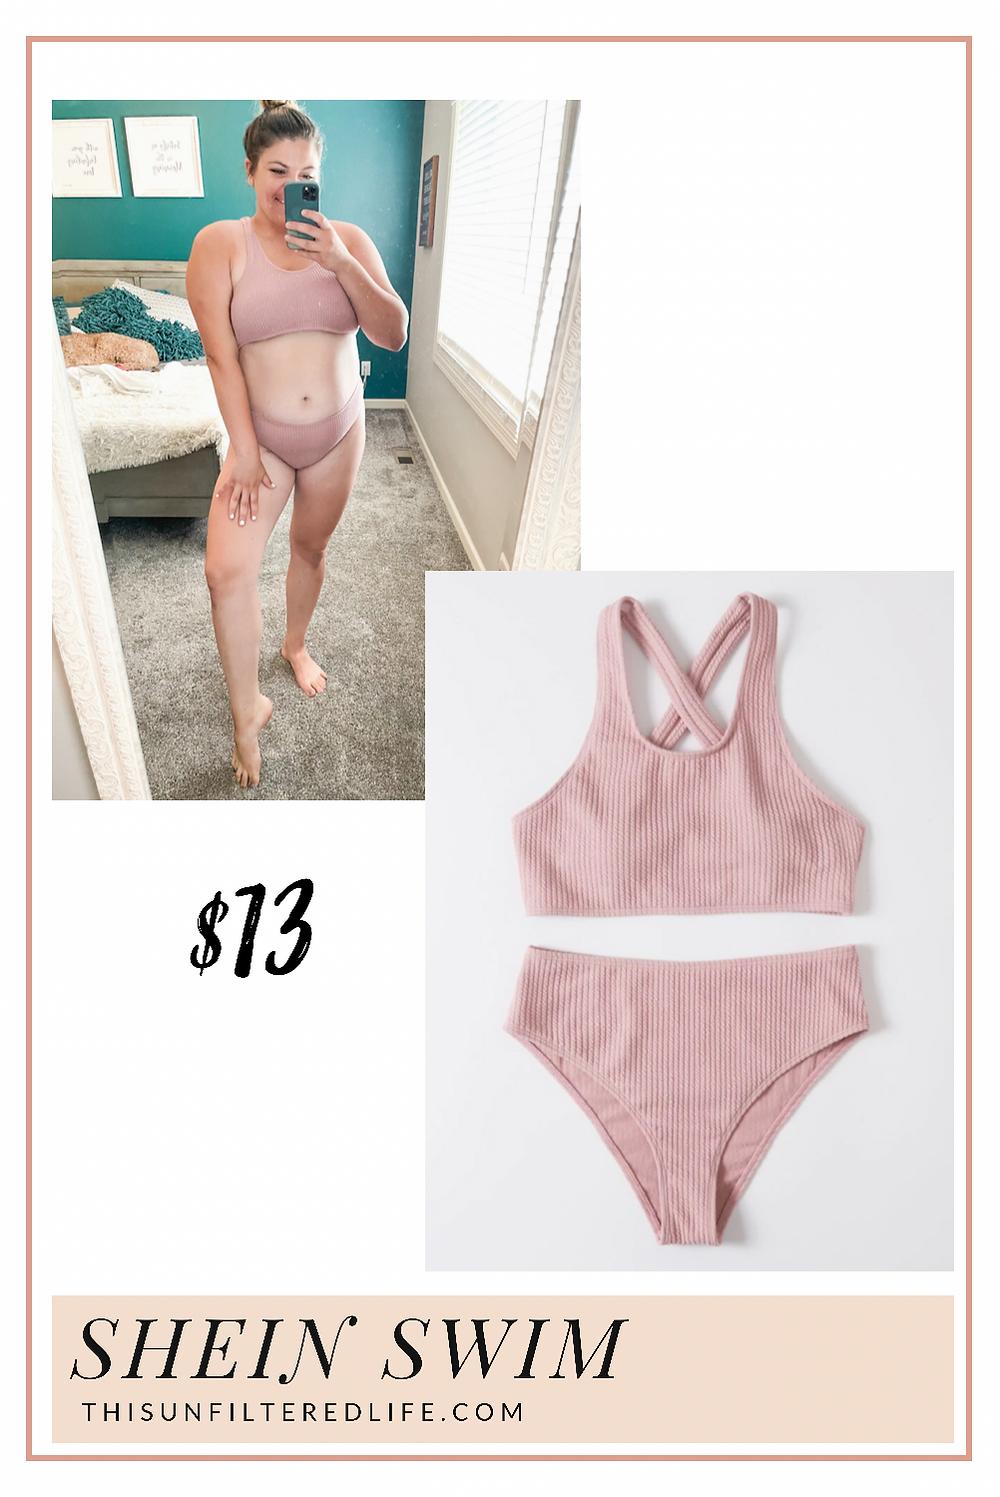 Textured high waisted bikini SHEIN plus size bikini midsize swimsuit curvy swimwear